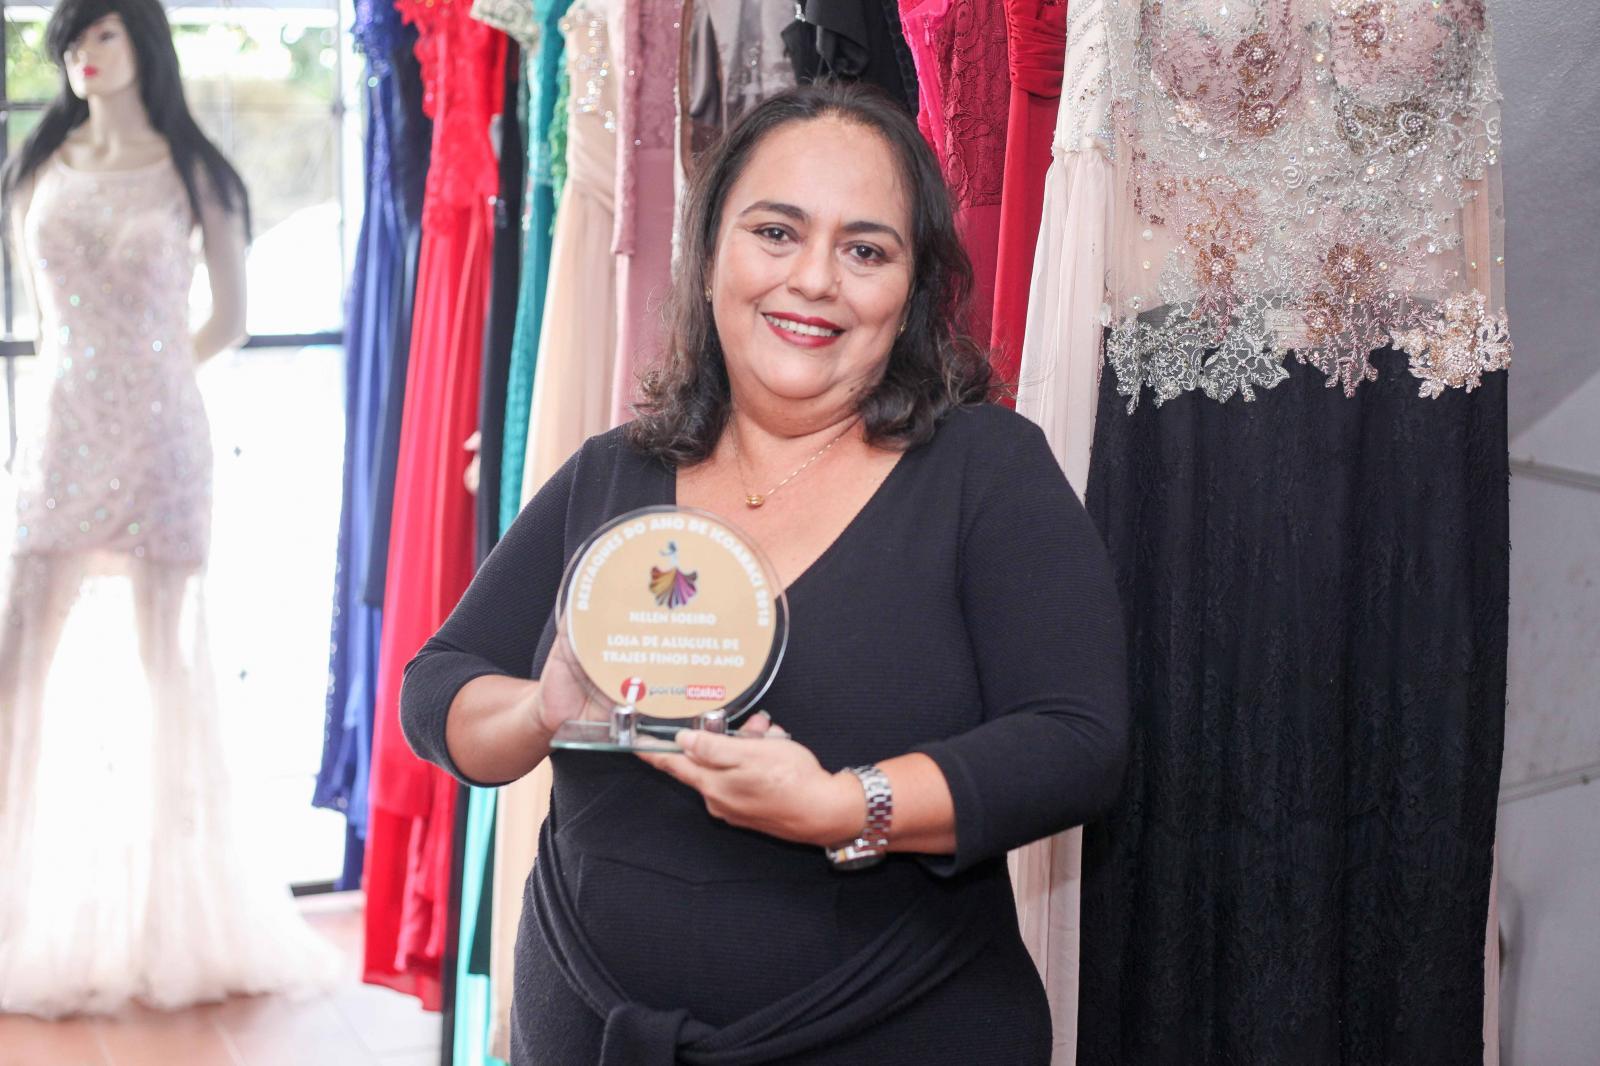 Helen Soeiro - Loja Aluguel de Trajes Finos de Ano de Icoaraci